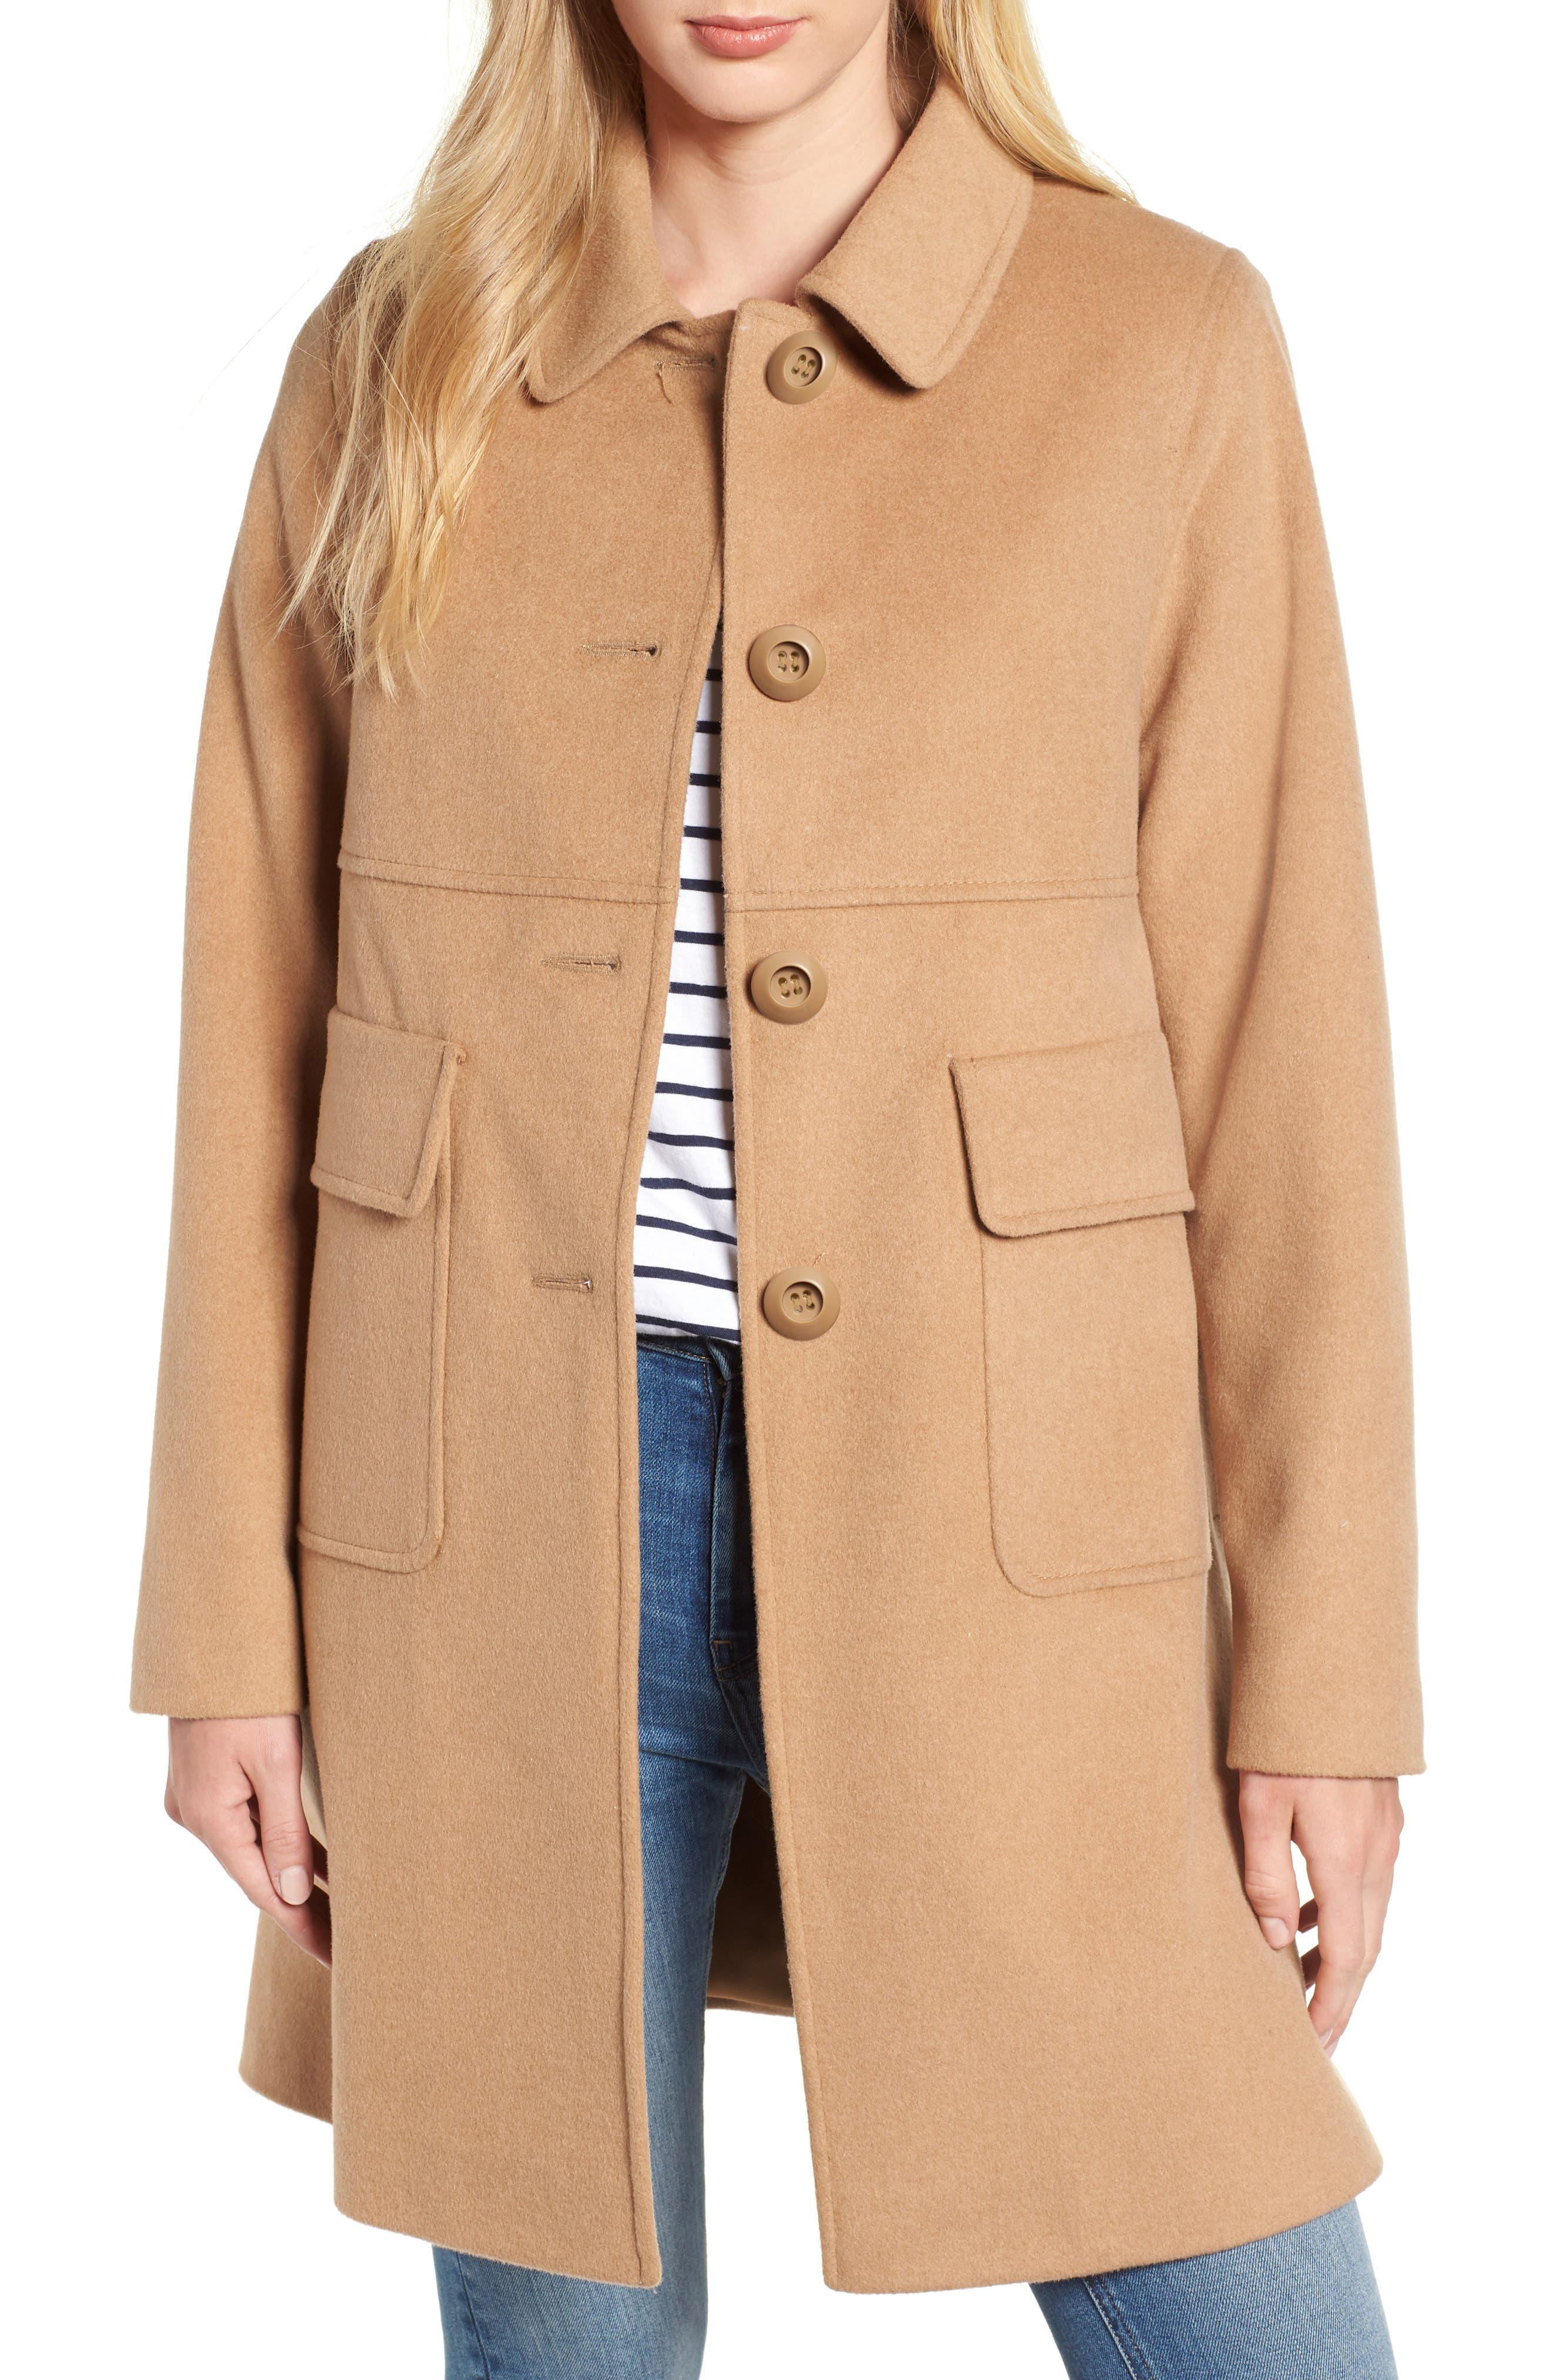 KRISTEN BLAKE Wool Walking Coat, Main, color, CAMEL